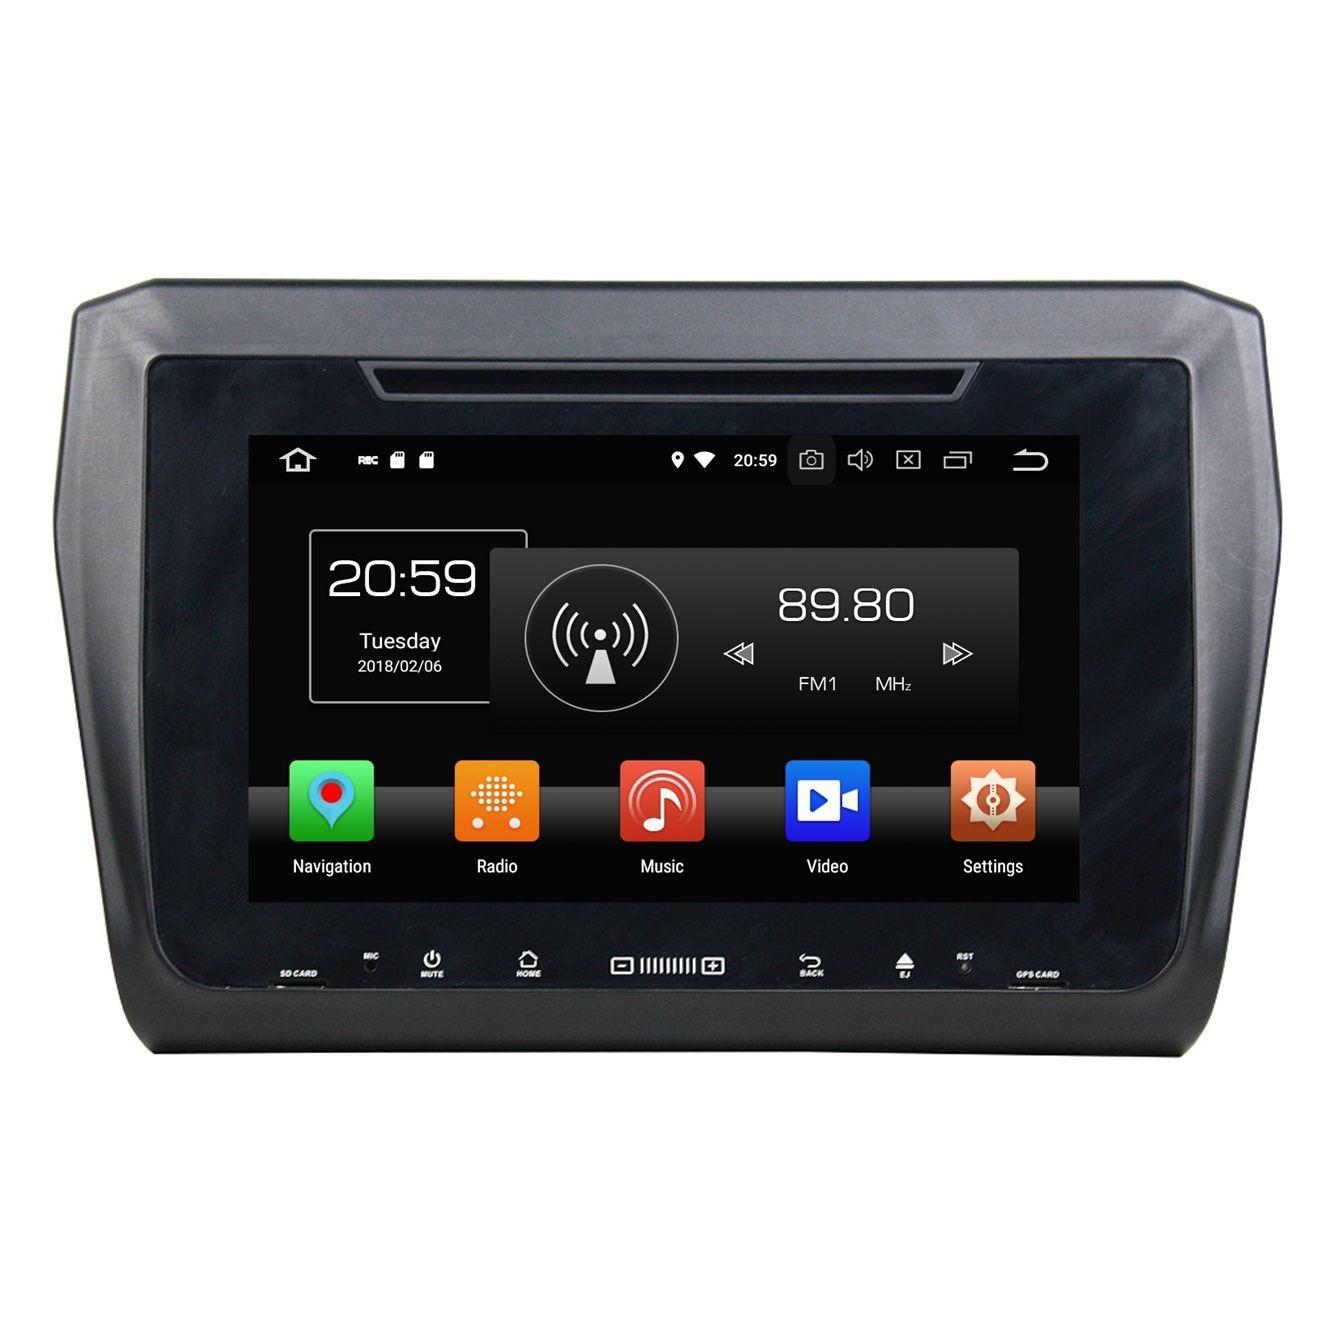 "IPS Screen 4GB+64GB Octa Core 2 din 9"" Android 8.0 Car DVD Player for Suzuki Swift 2017 2018 Stereo RDS Radio GPS Bluetooth WIFI USB DVR"